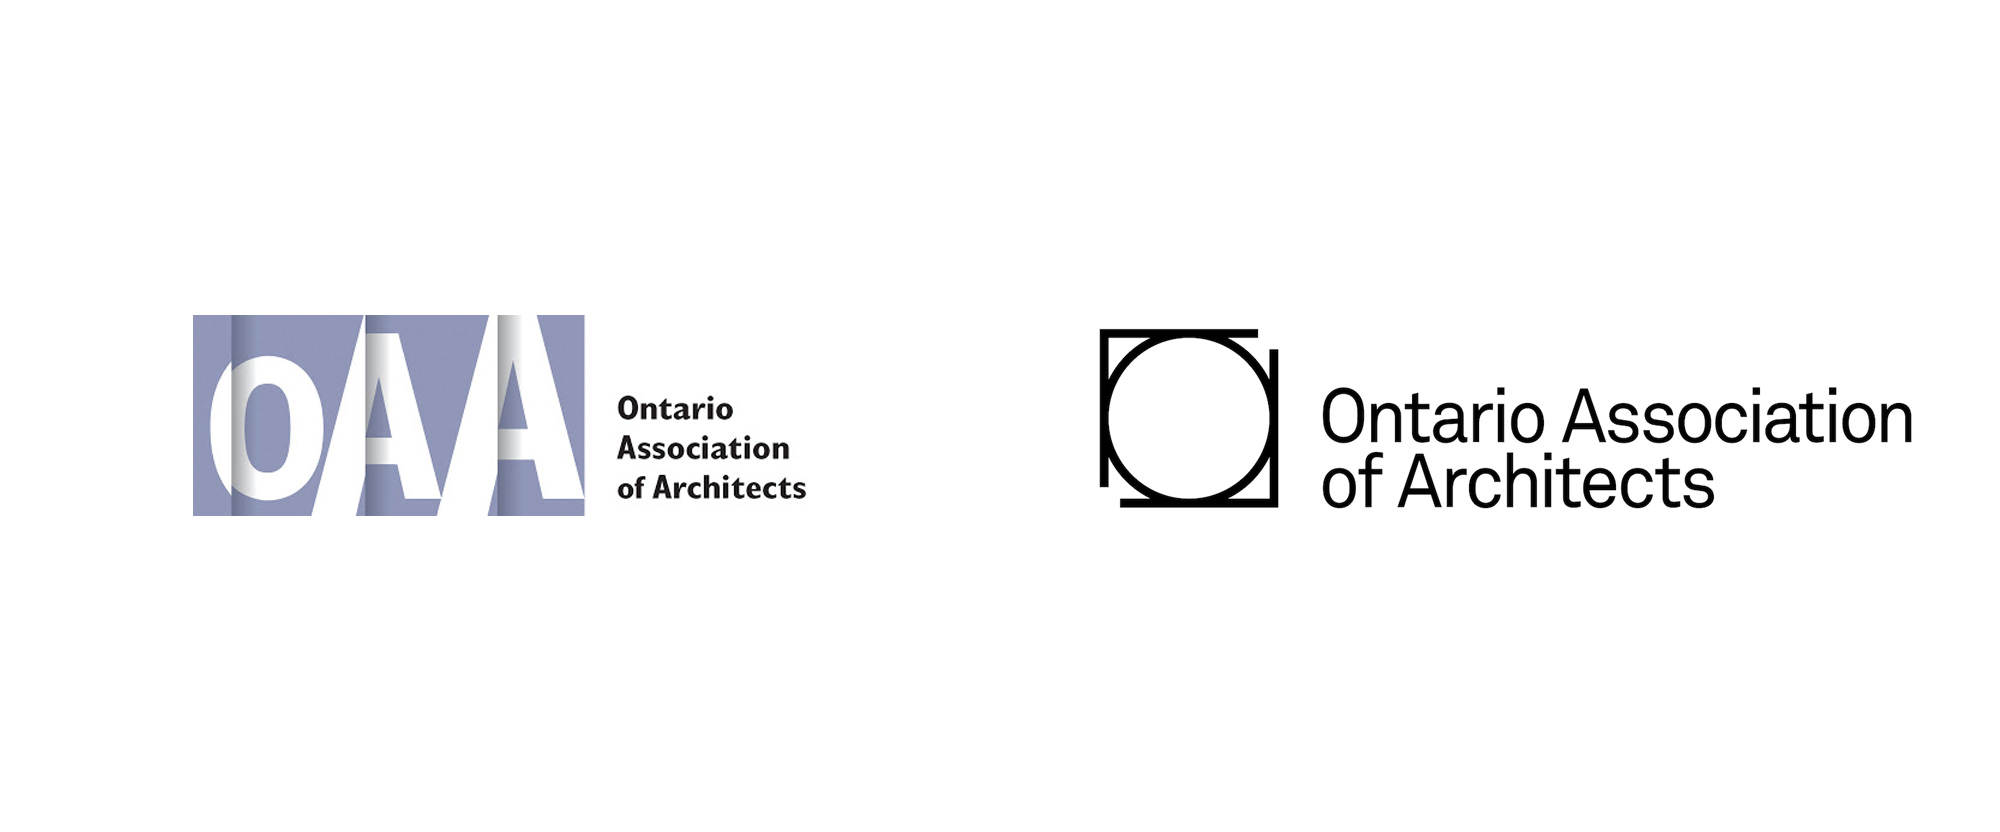 New Logo for Ontario Association of Architects by Leo Burnett Canada